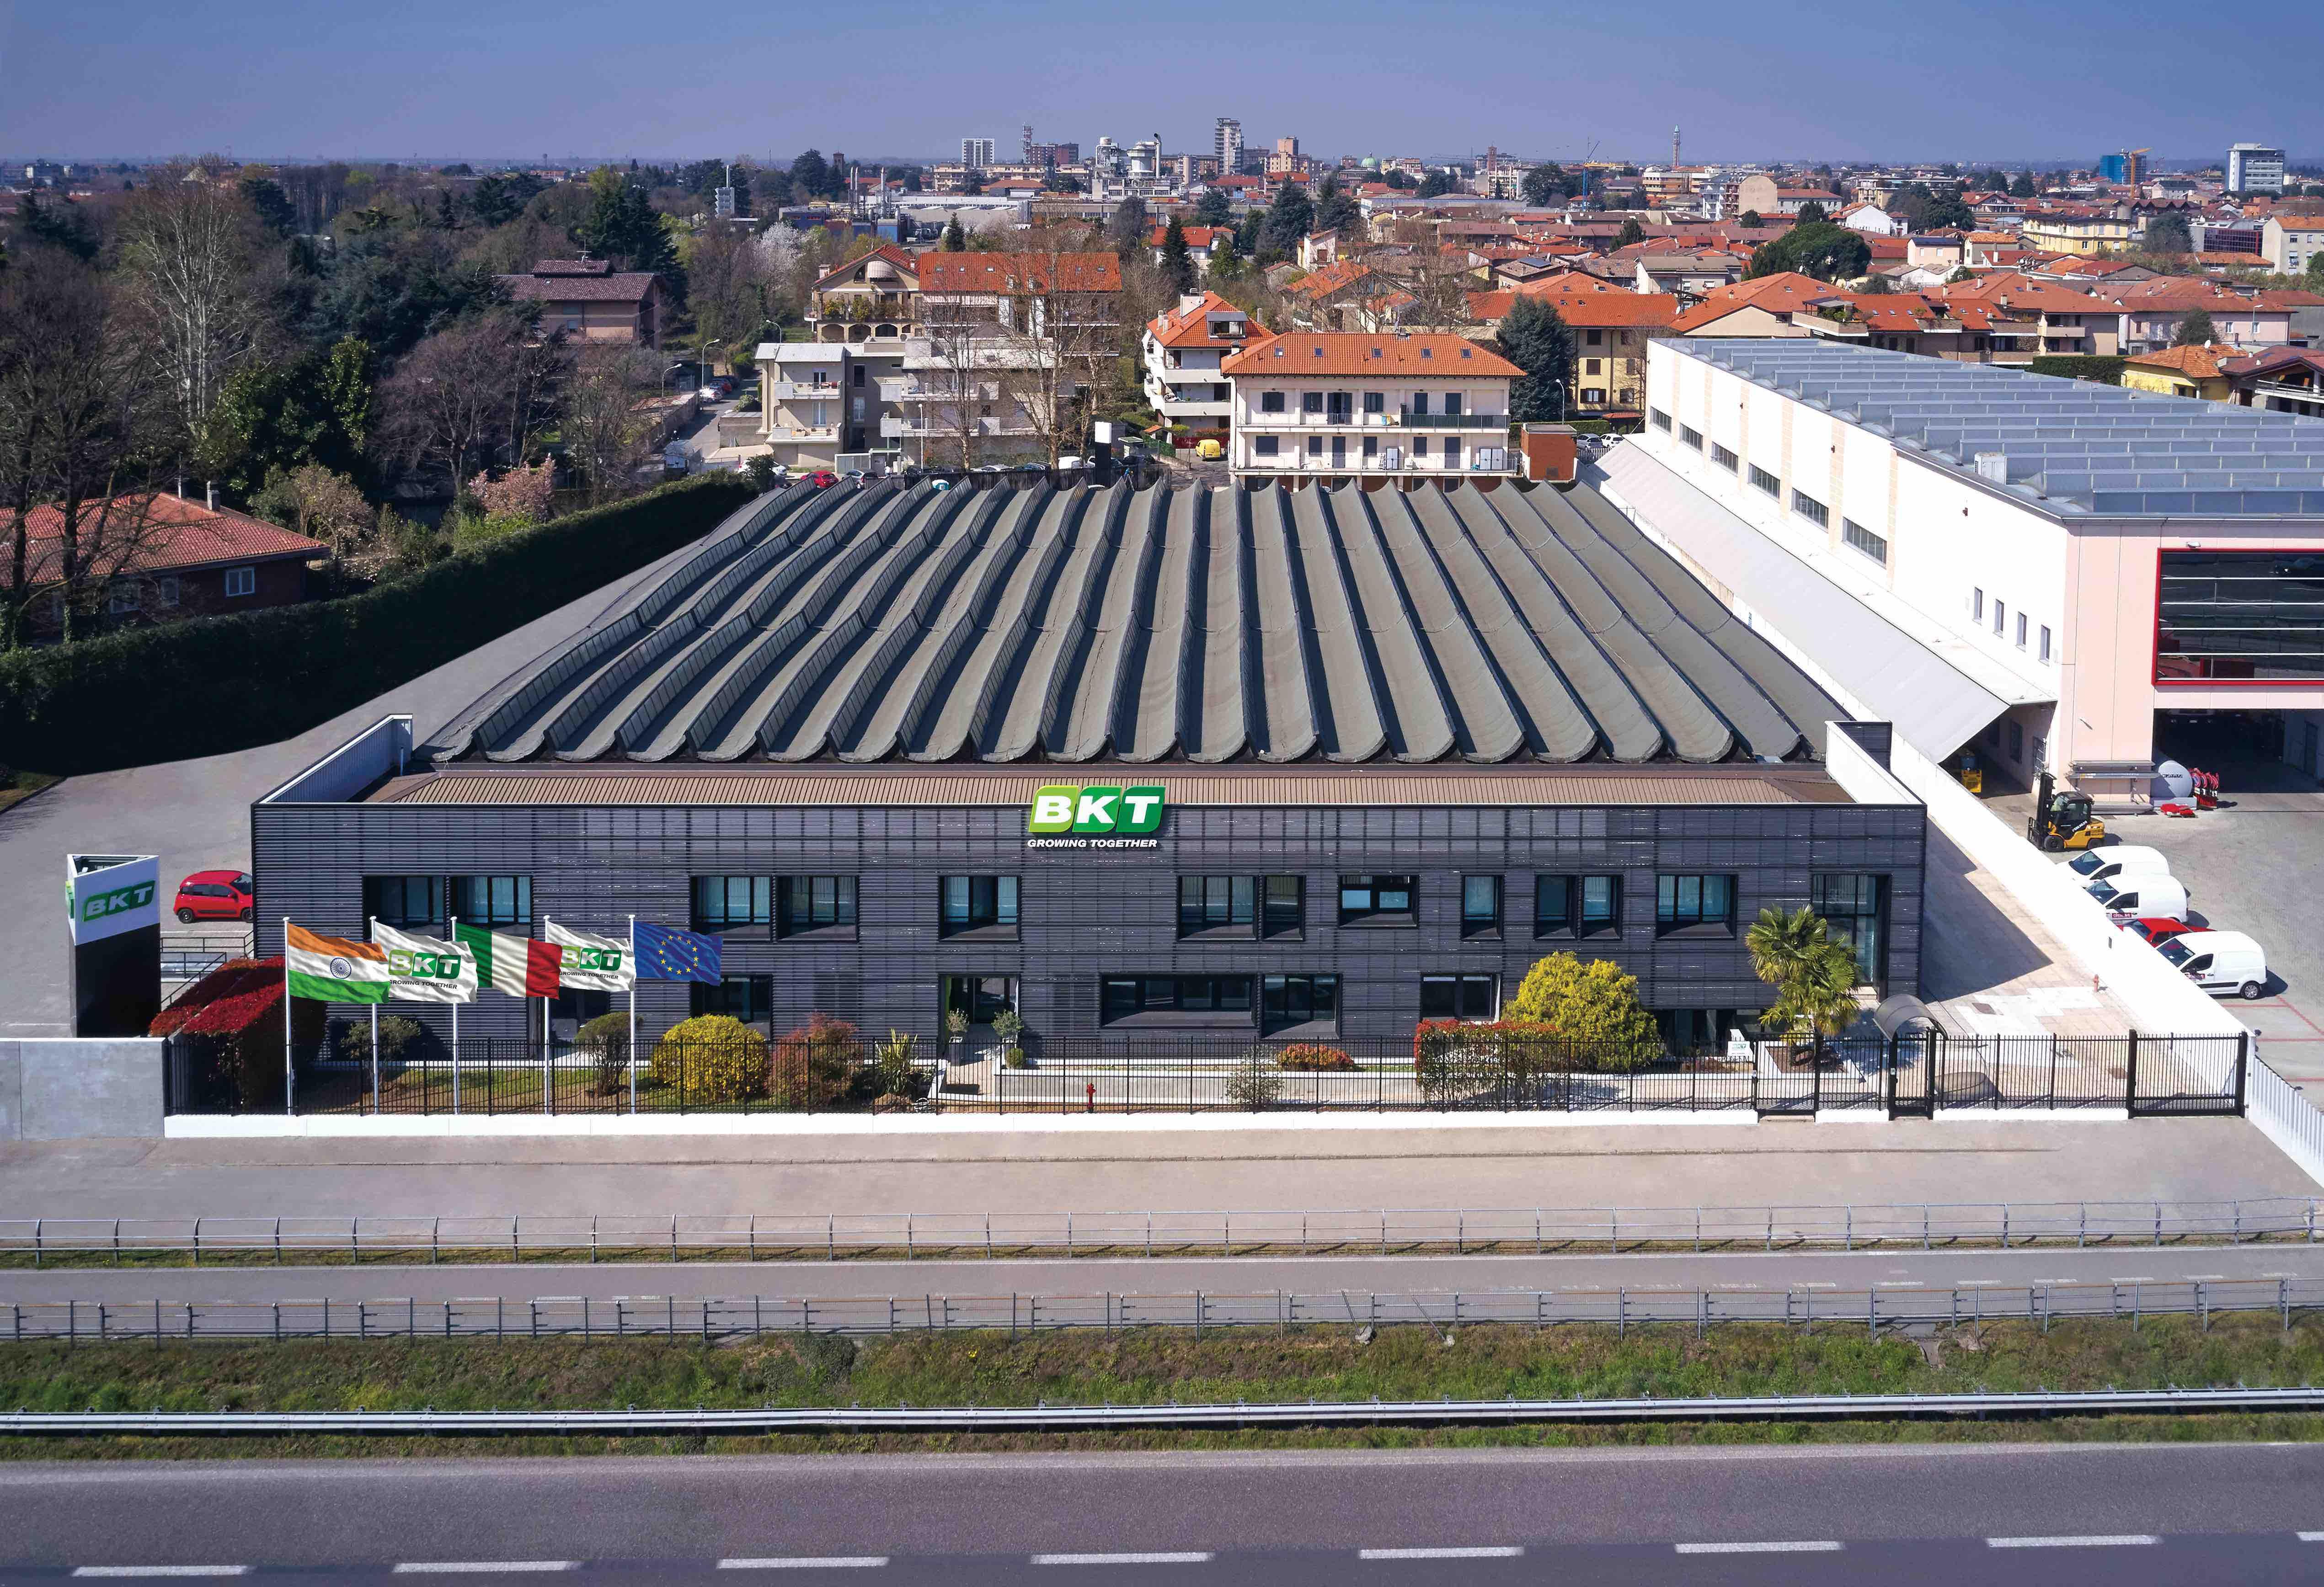 BKT - Nuovasede europea a Seregno